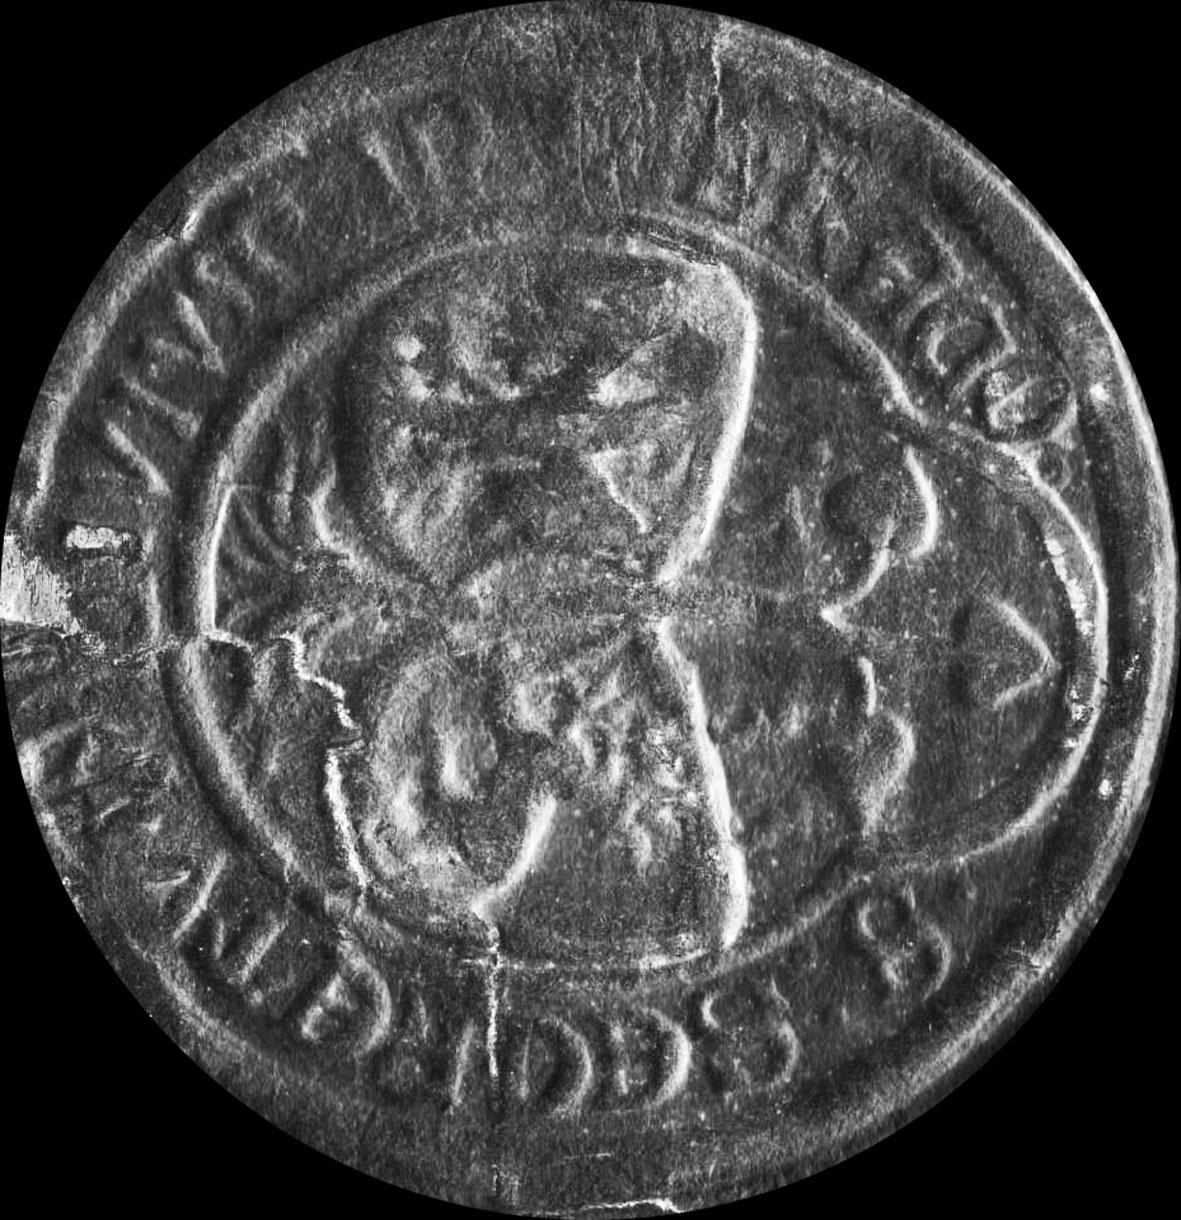 sigillum Girolamo Doria1533 ?? 1e5abc